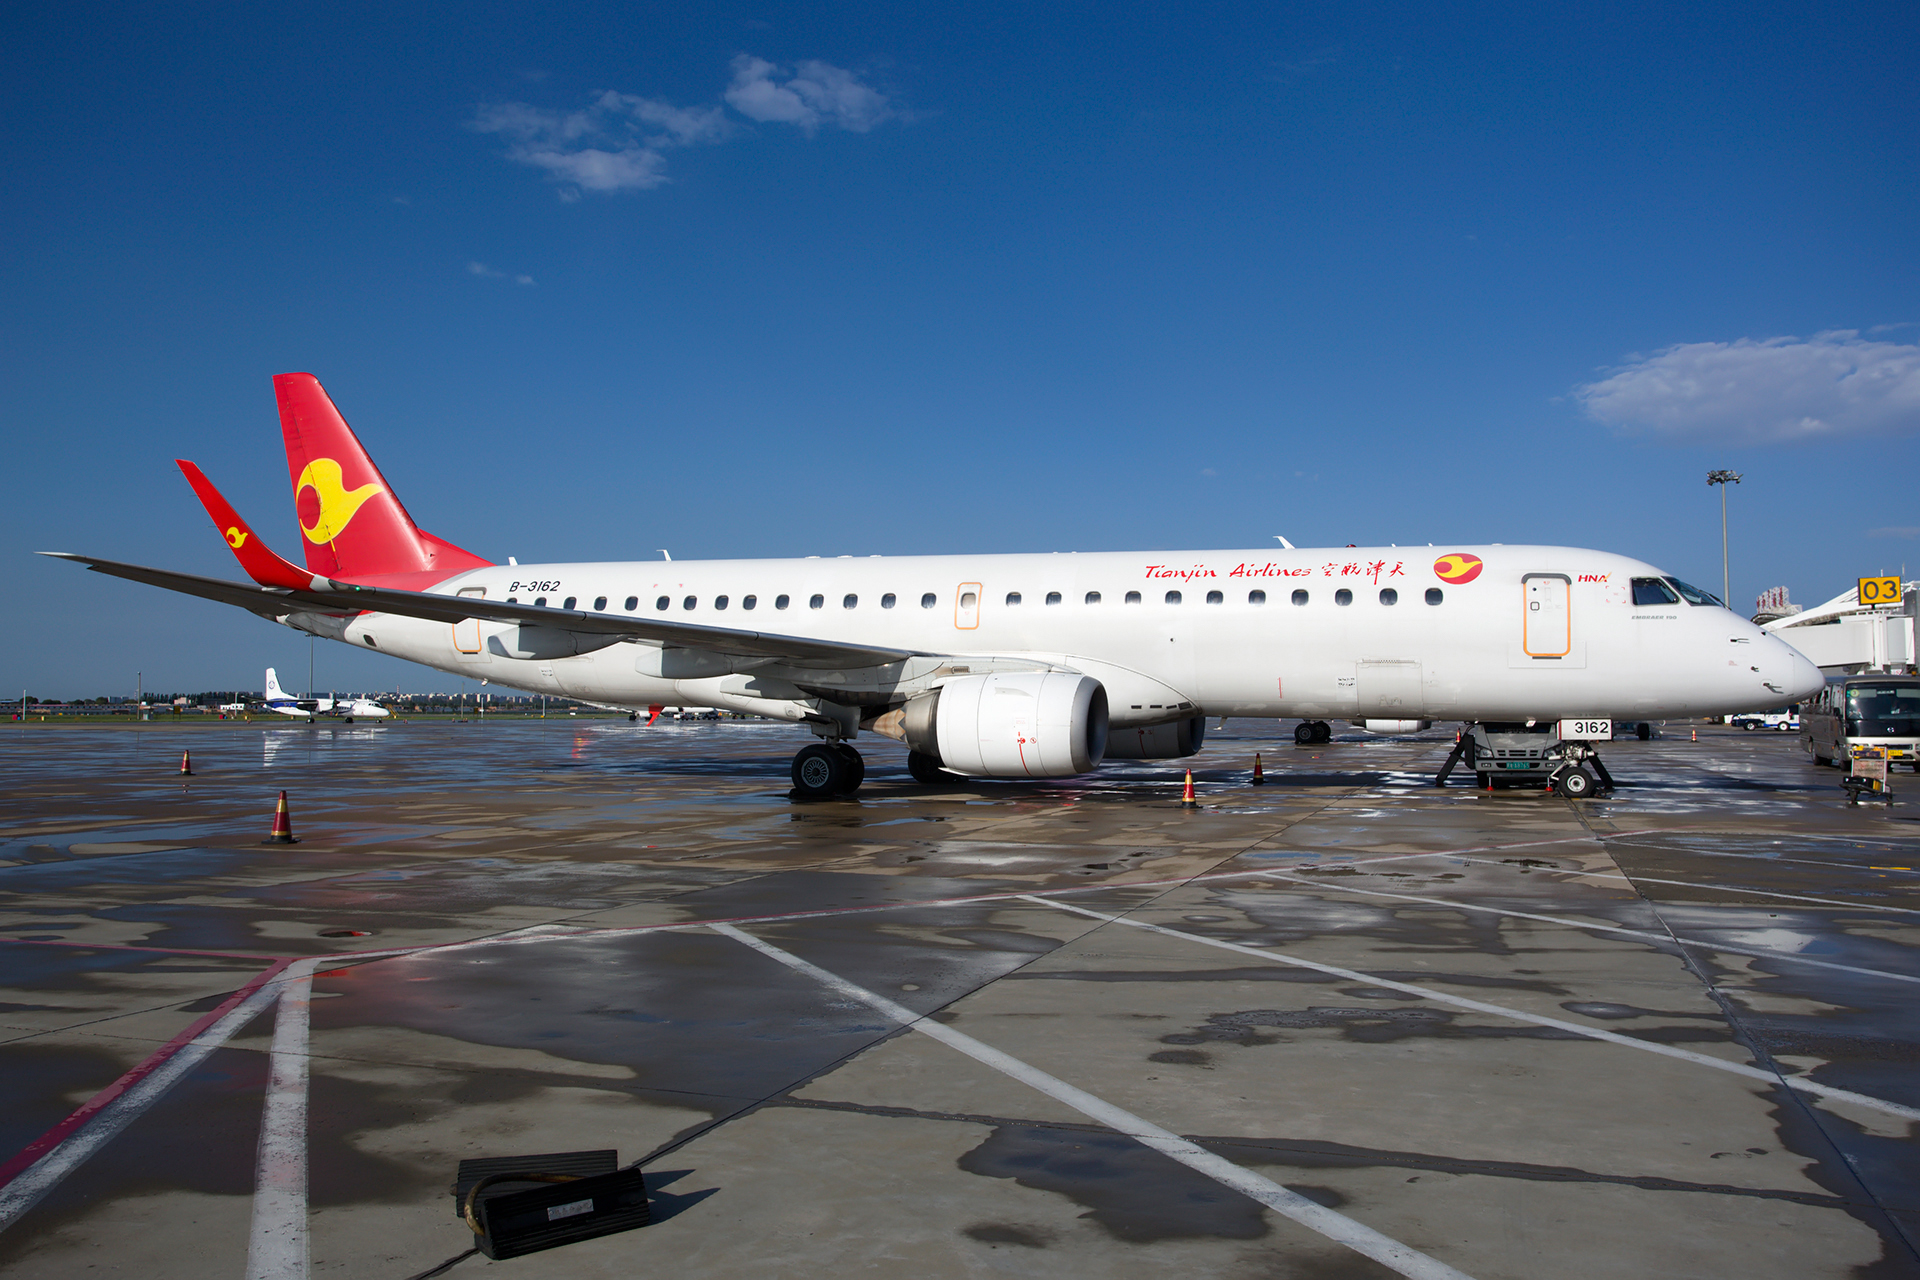 Re:[原创][NZH]。。。满洲里。。。 EMBRAER E-190 B-3162 中国呼和浩特白塔国际机场